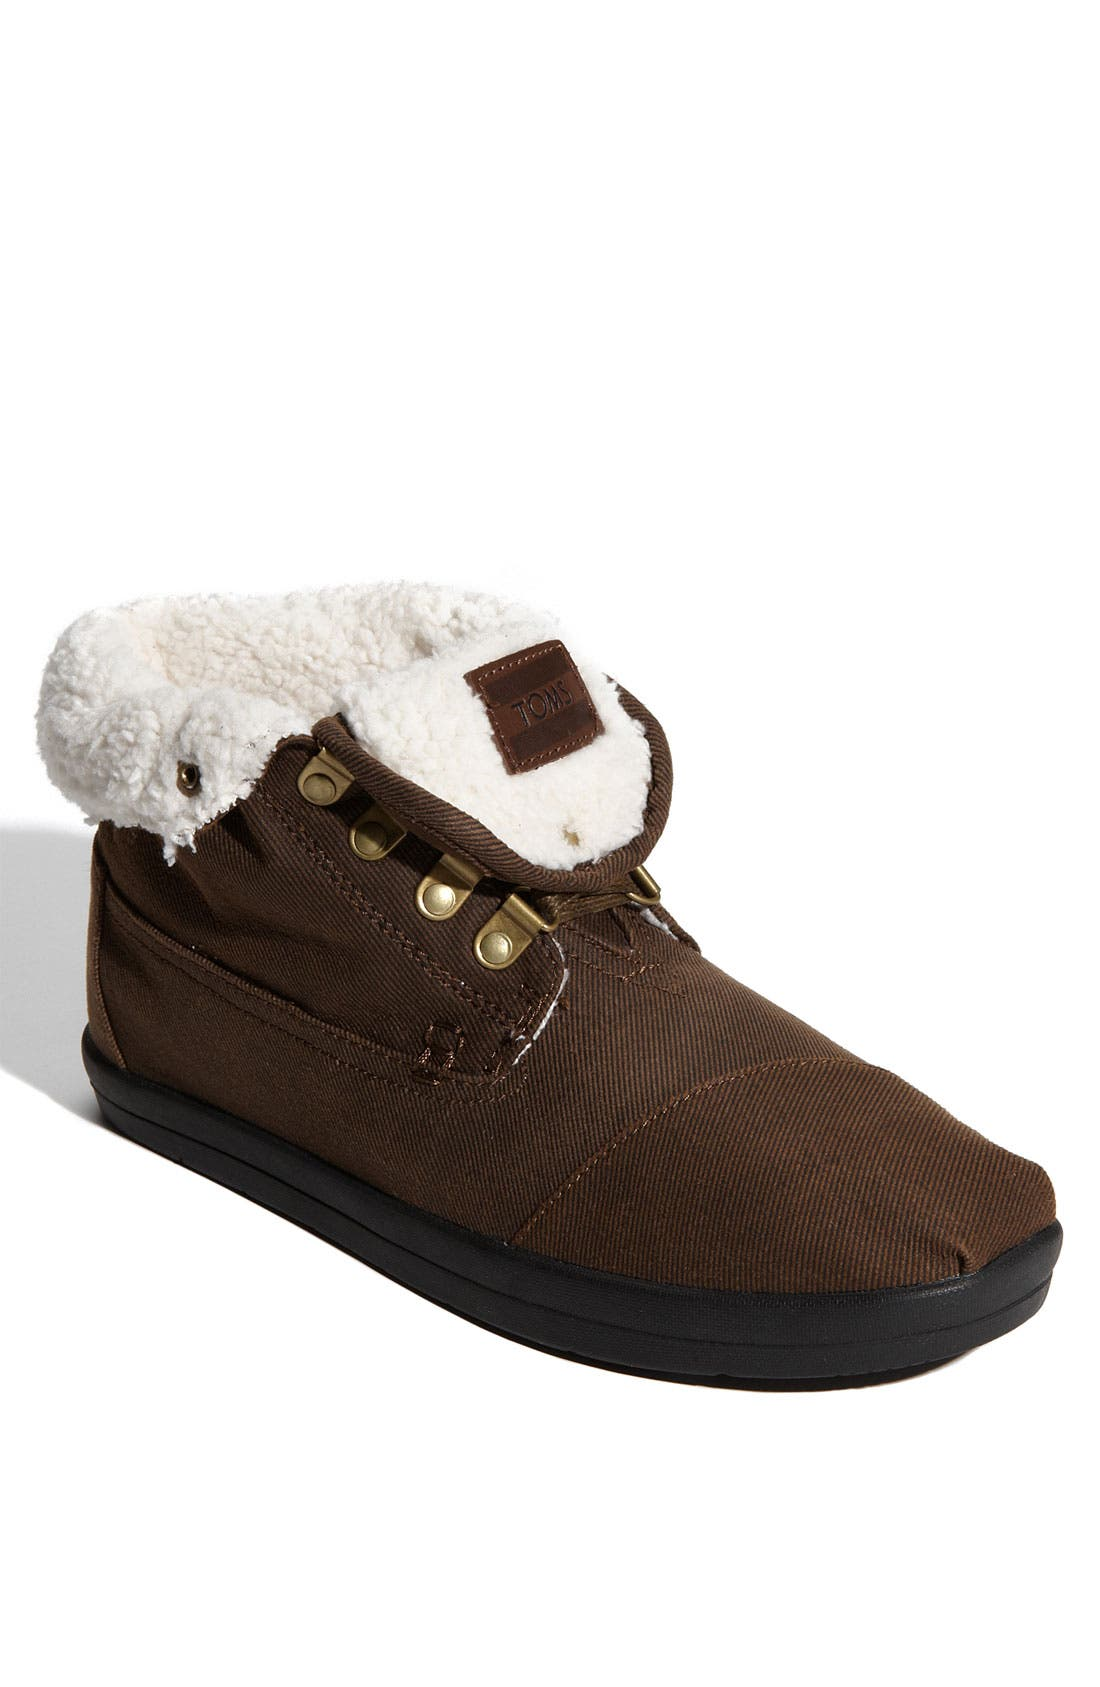 Main Image - TOMS 'Highlands' Fleece Boot (Men)